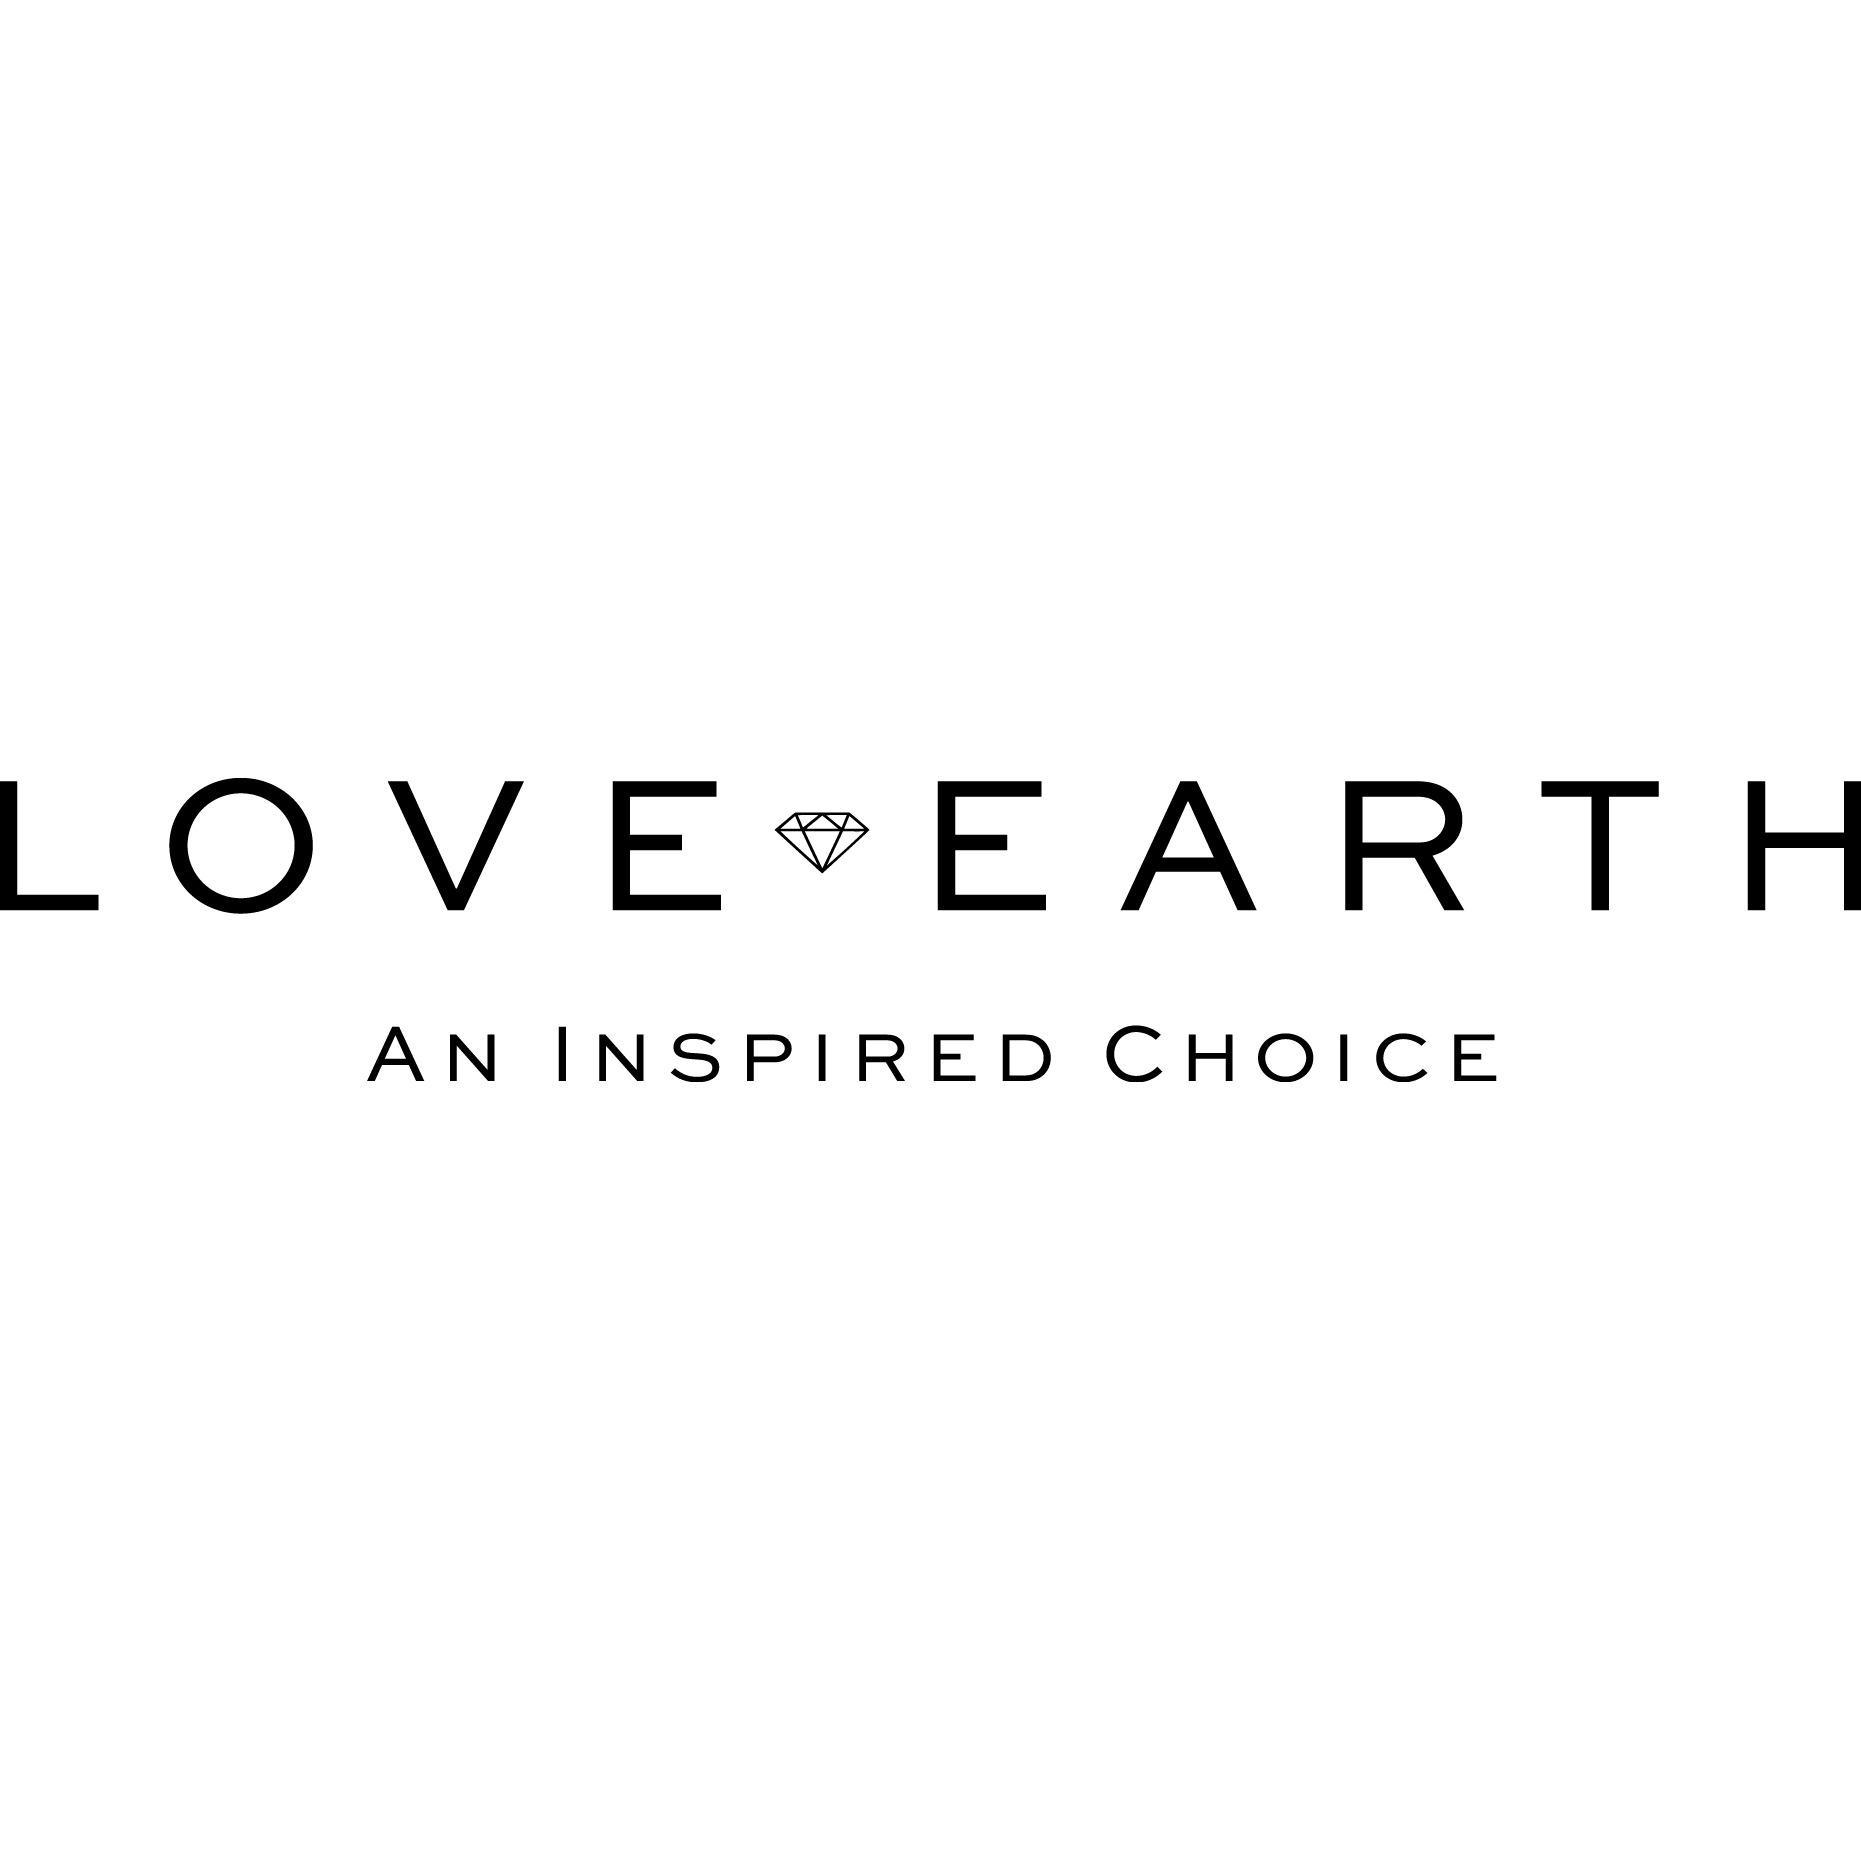 Love Earth - An Inspired Choice - burlington, MA - Jewelry & Watch Repair